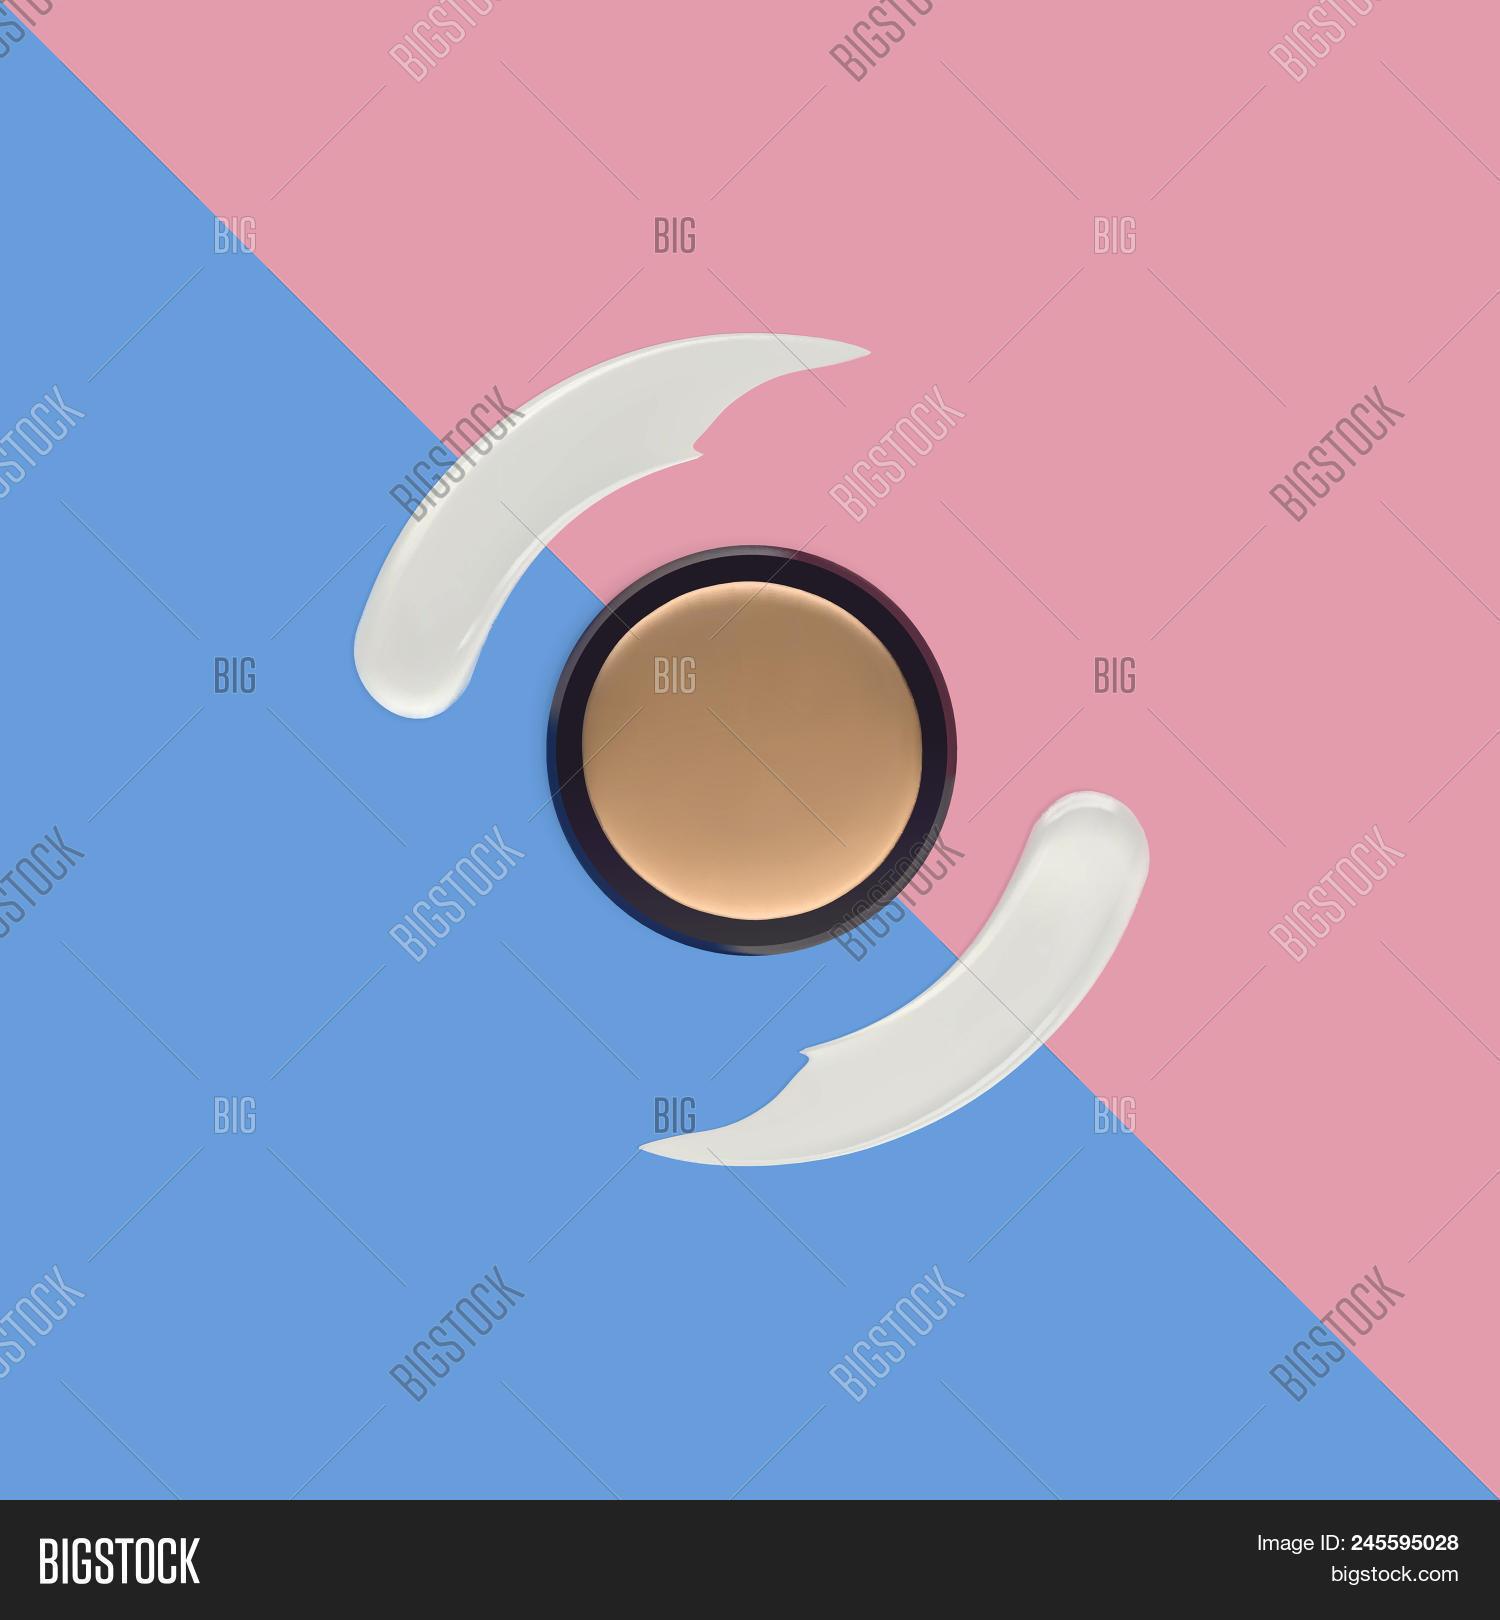 Colors Combination Vector & Photo (Free Trial) | Bigstock